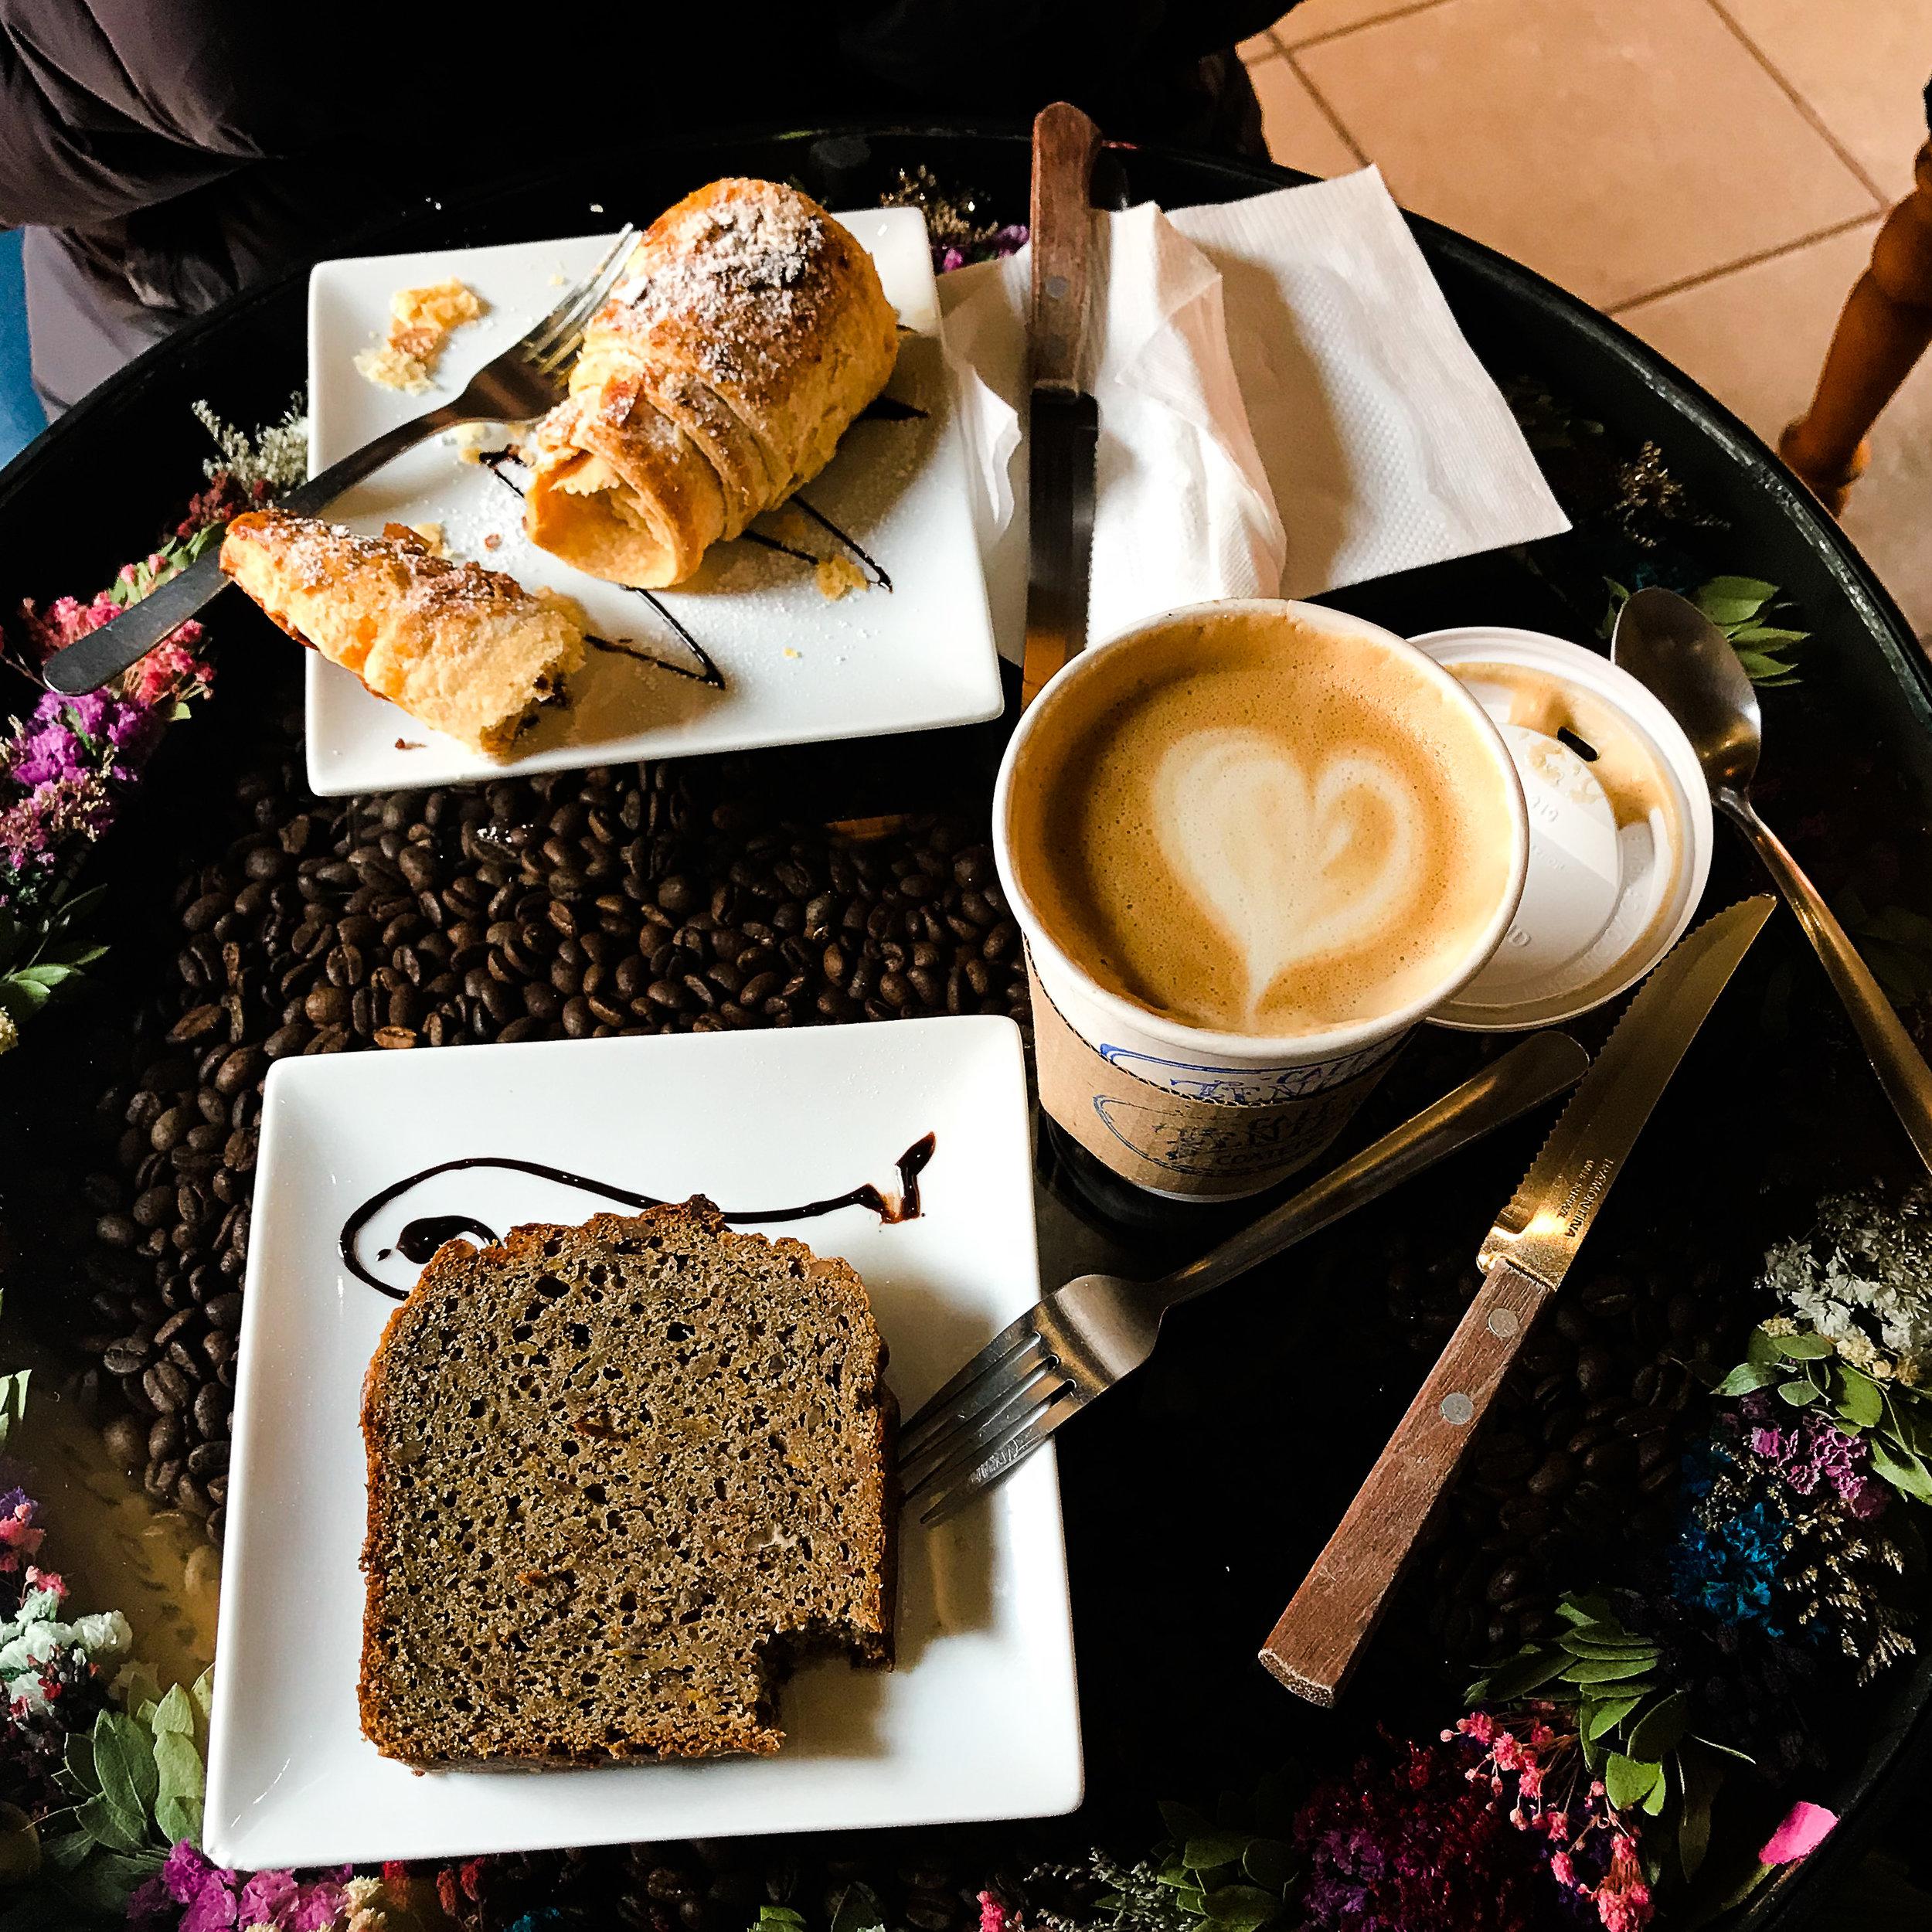 mexican-food-san-miguel-de-allende-restuarants-coffee-cafes-18.jpg